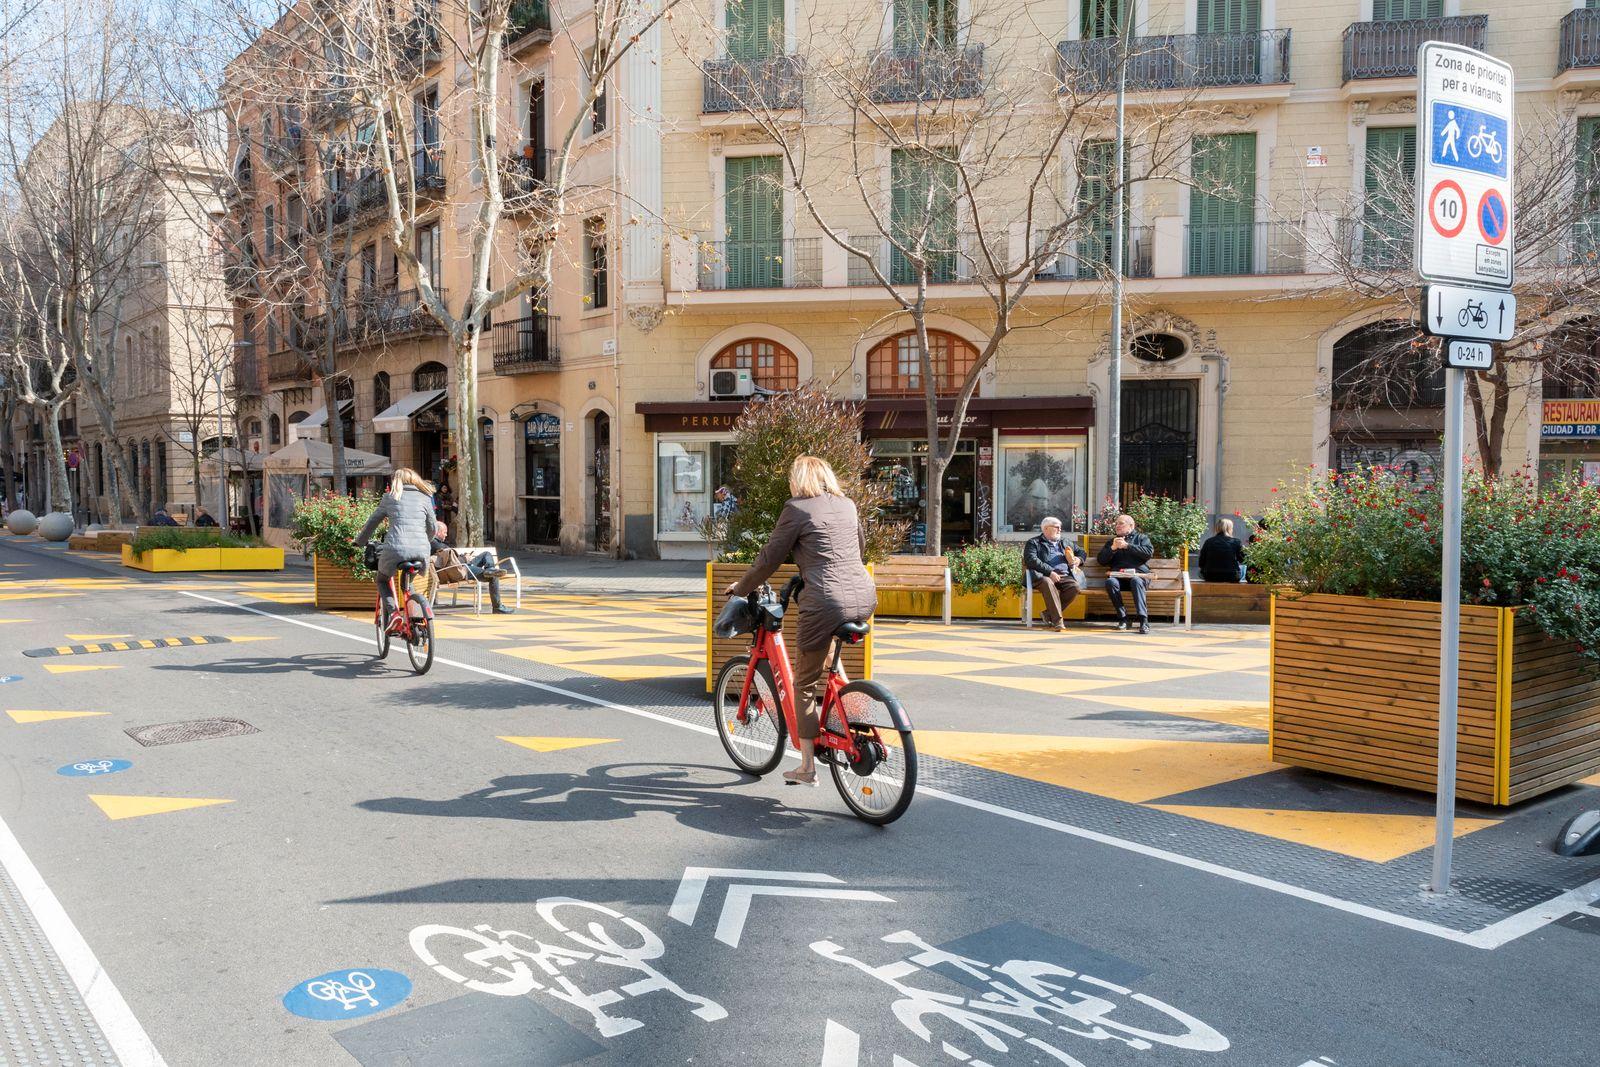 Spanien, Katalonien, Barcelona, Superblock Projekt, Stadtteil Sant Antoni. Verkehrsberuhigte Strasse Parlament. Die Strasse ist Teil des Superblock Projekts des Sadtteils Sant Antoni.